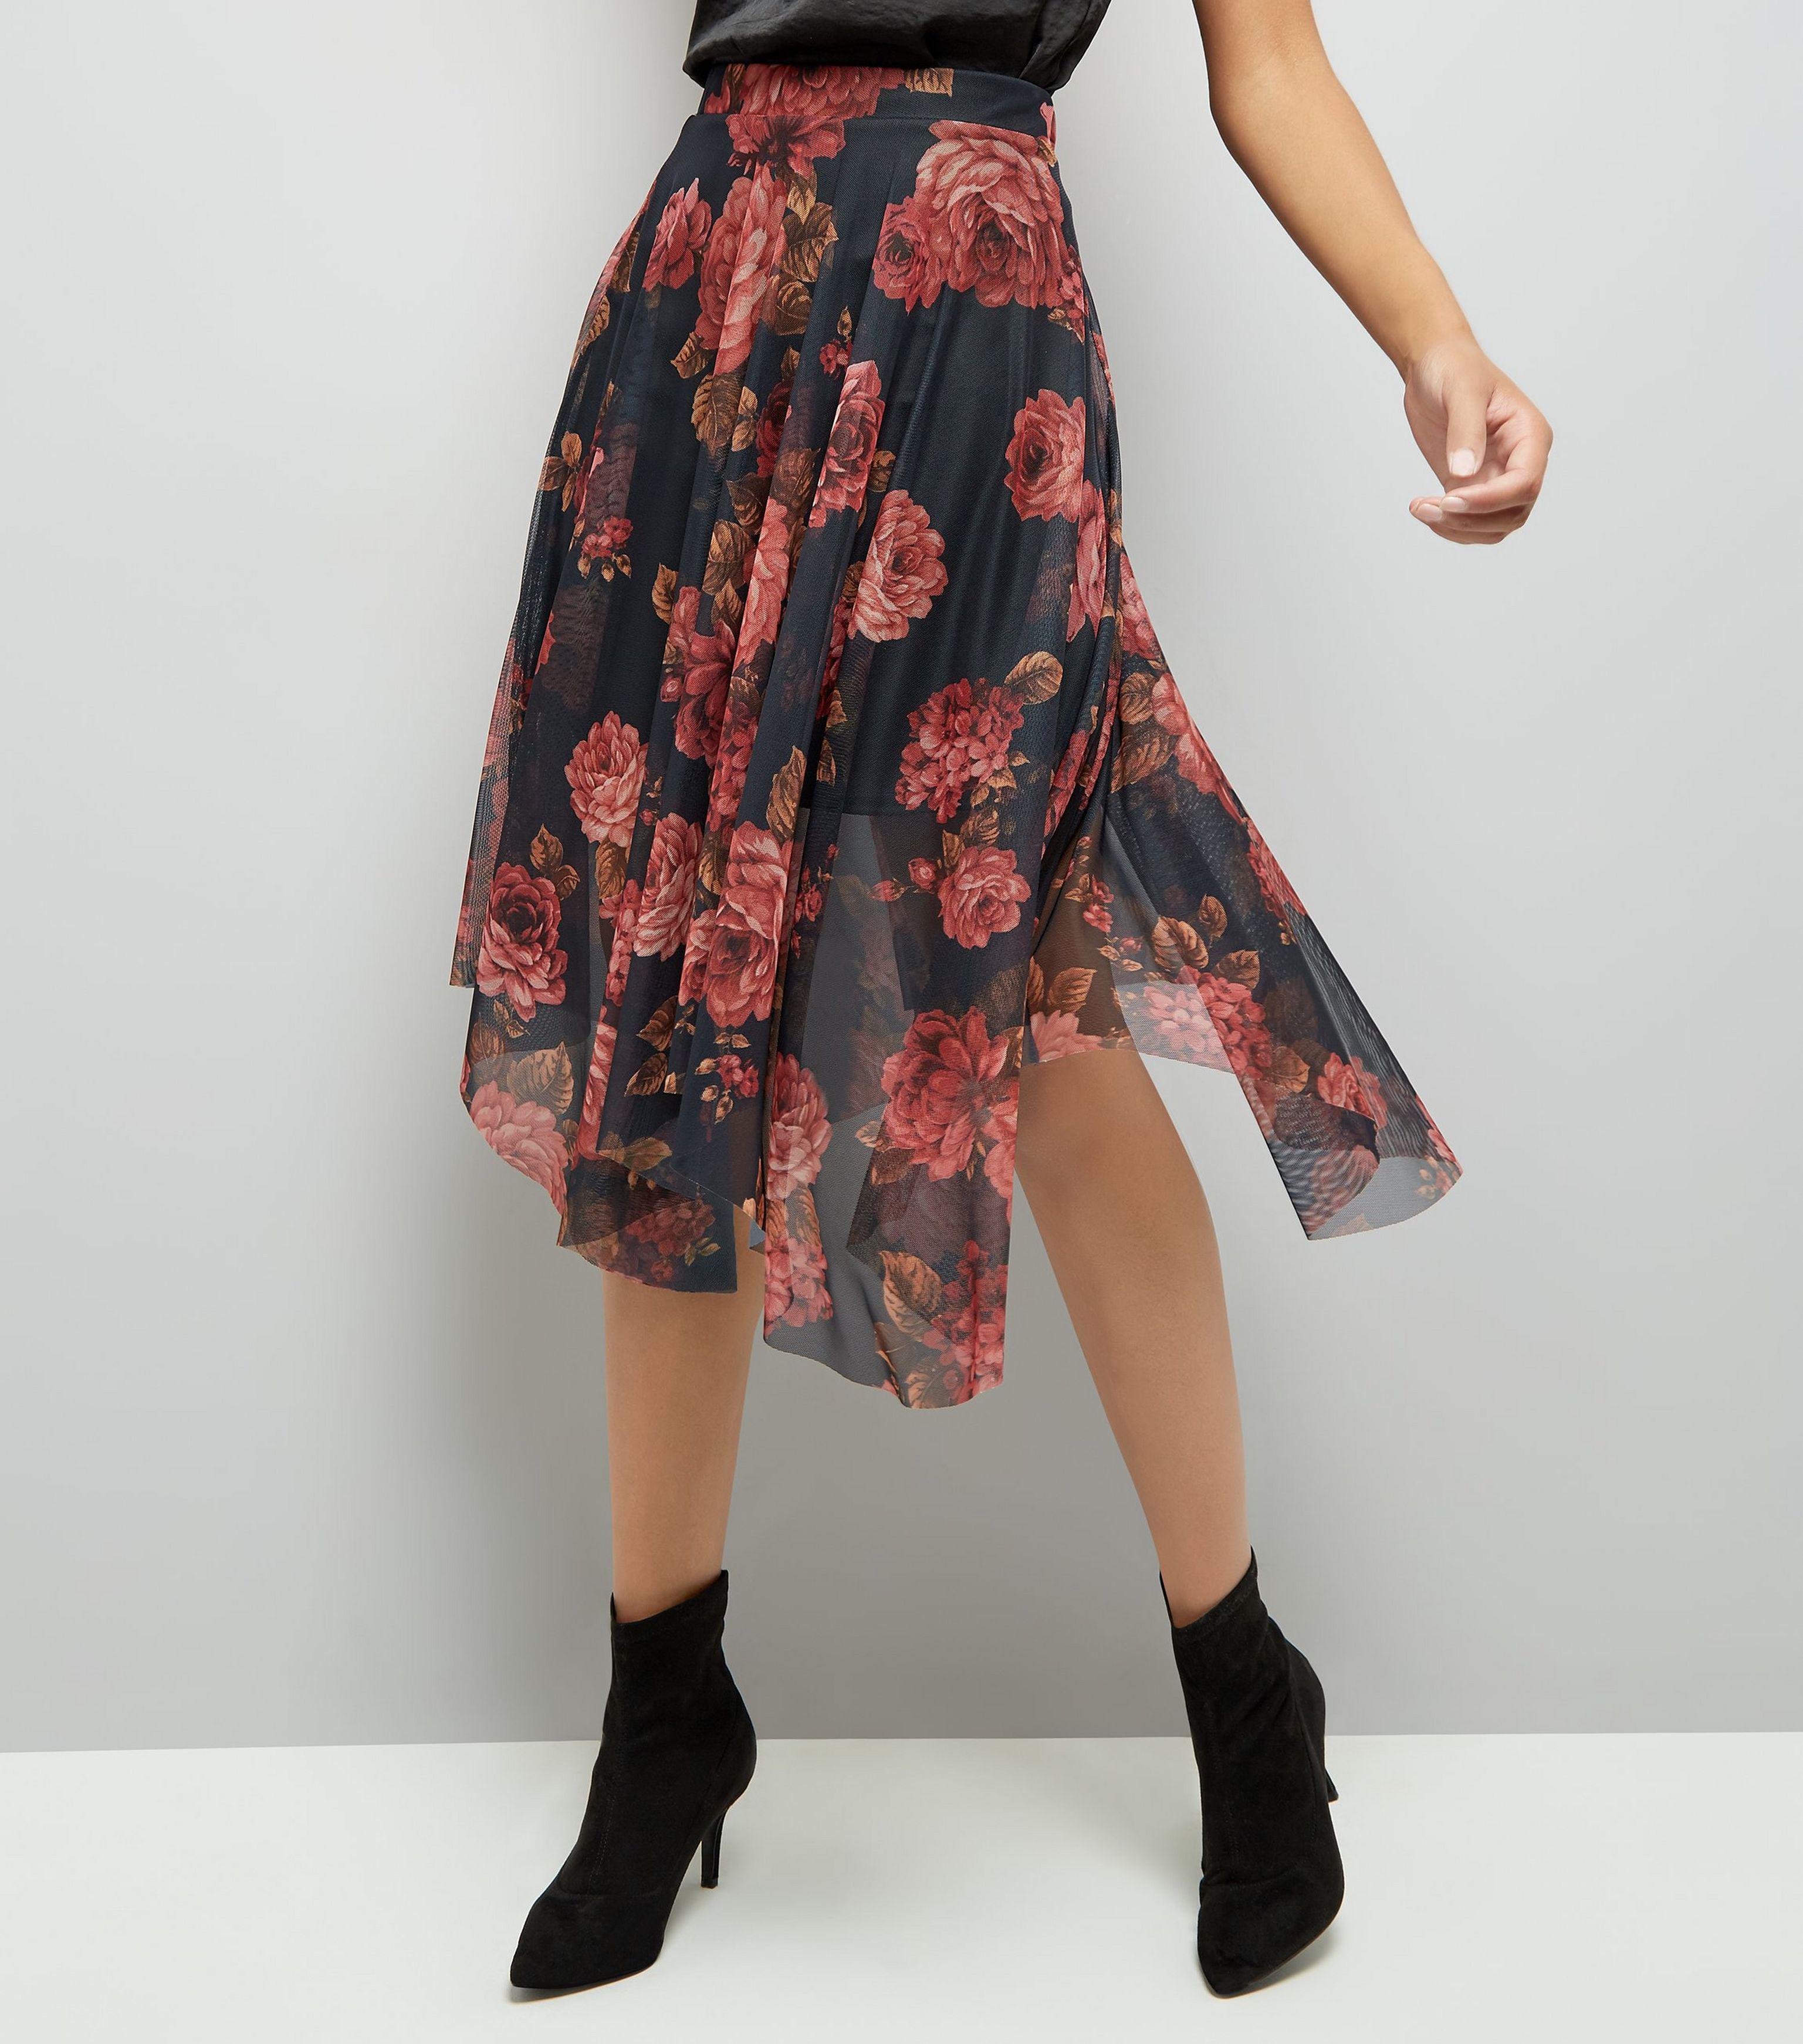 d4d2910522 New Look Black Floral Print Mesh Hanky Hem Midi Skirt in Black - Lyst